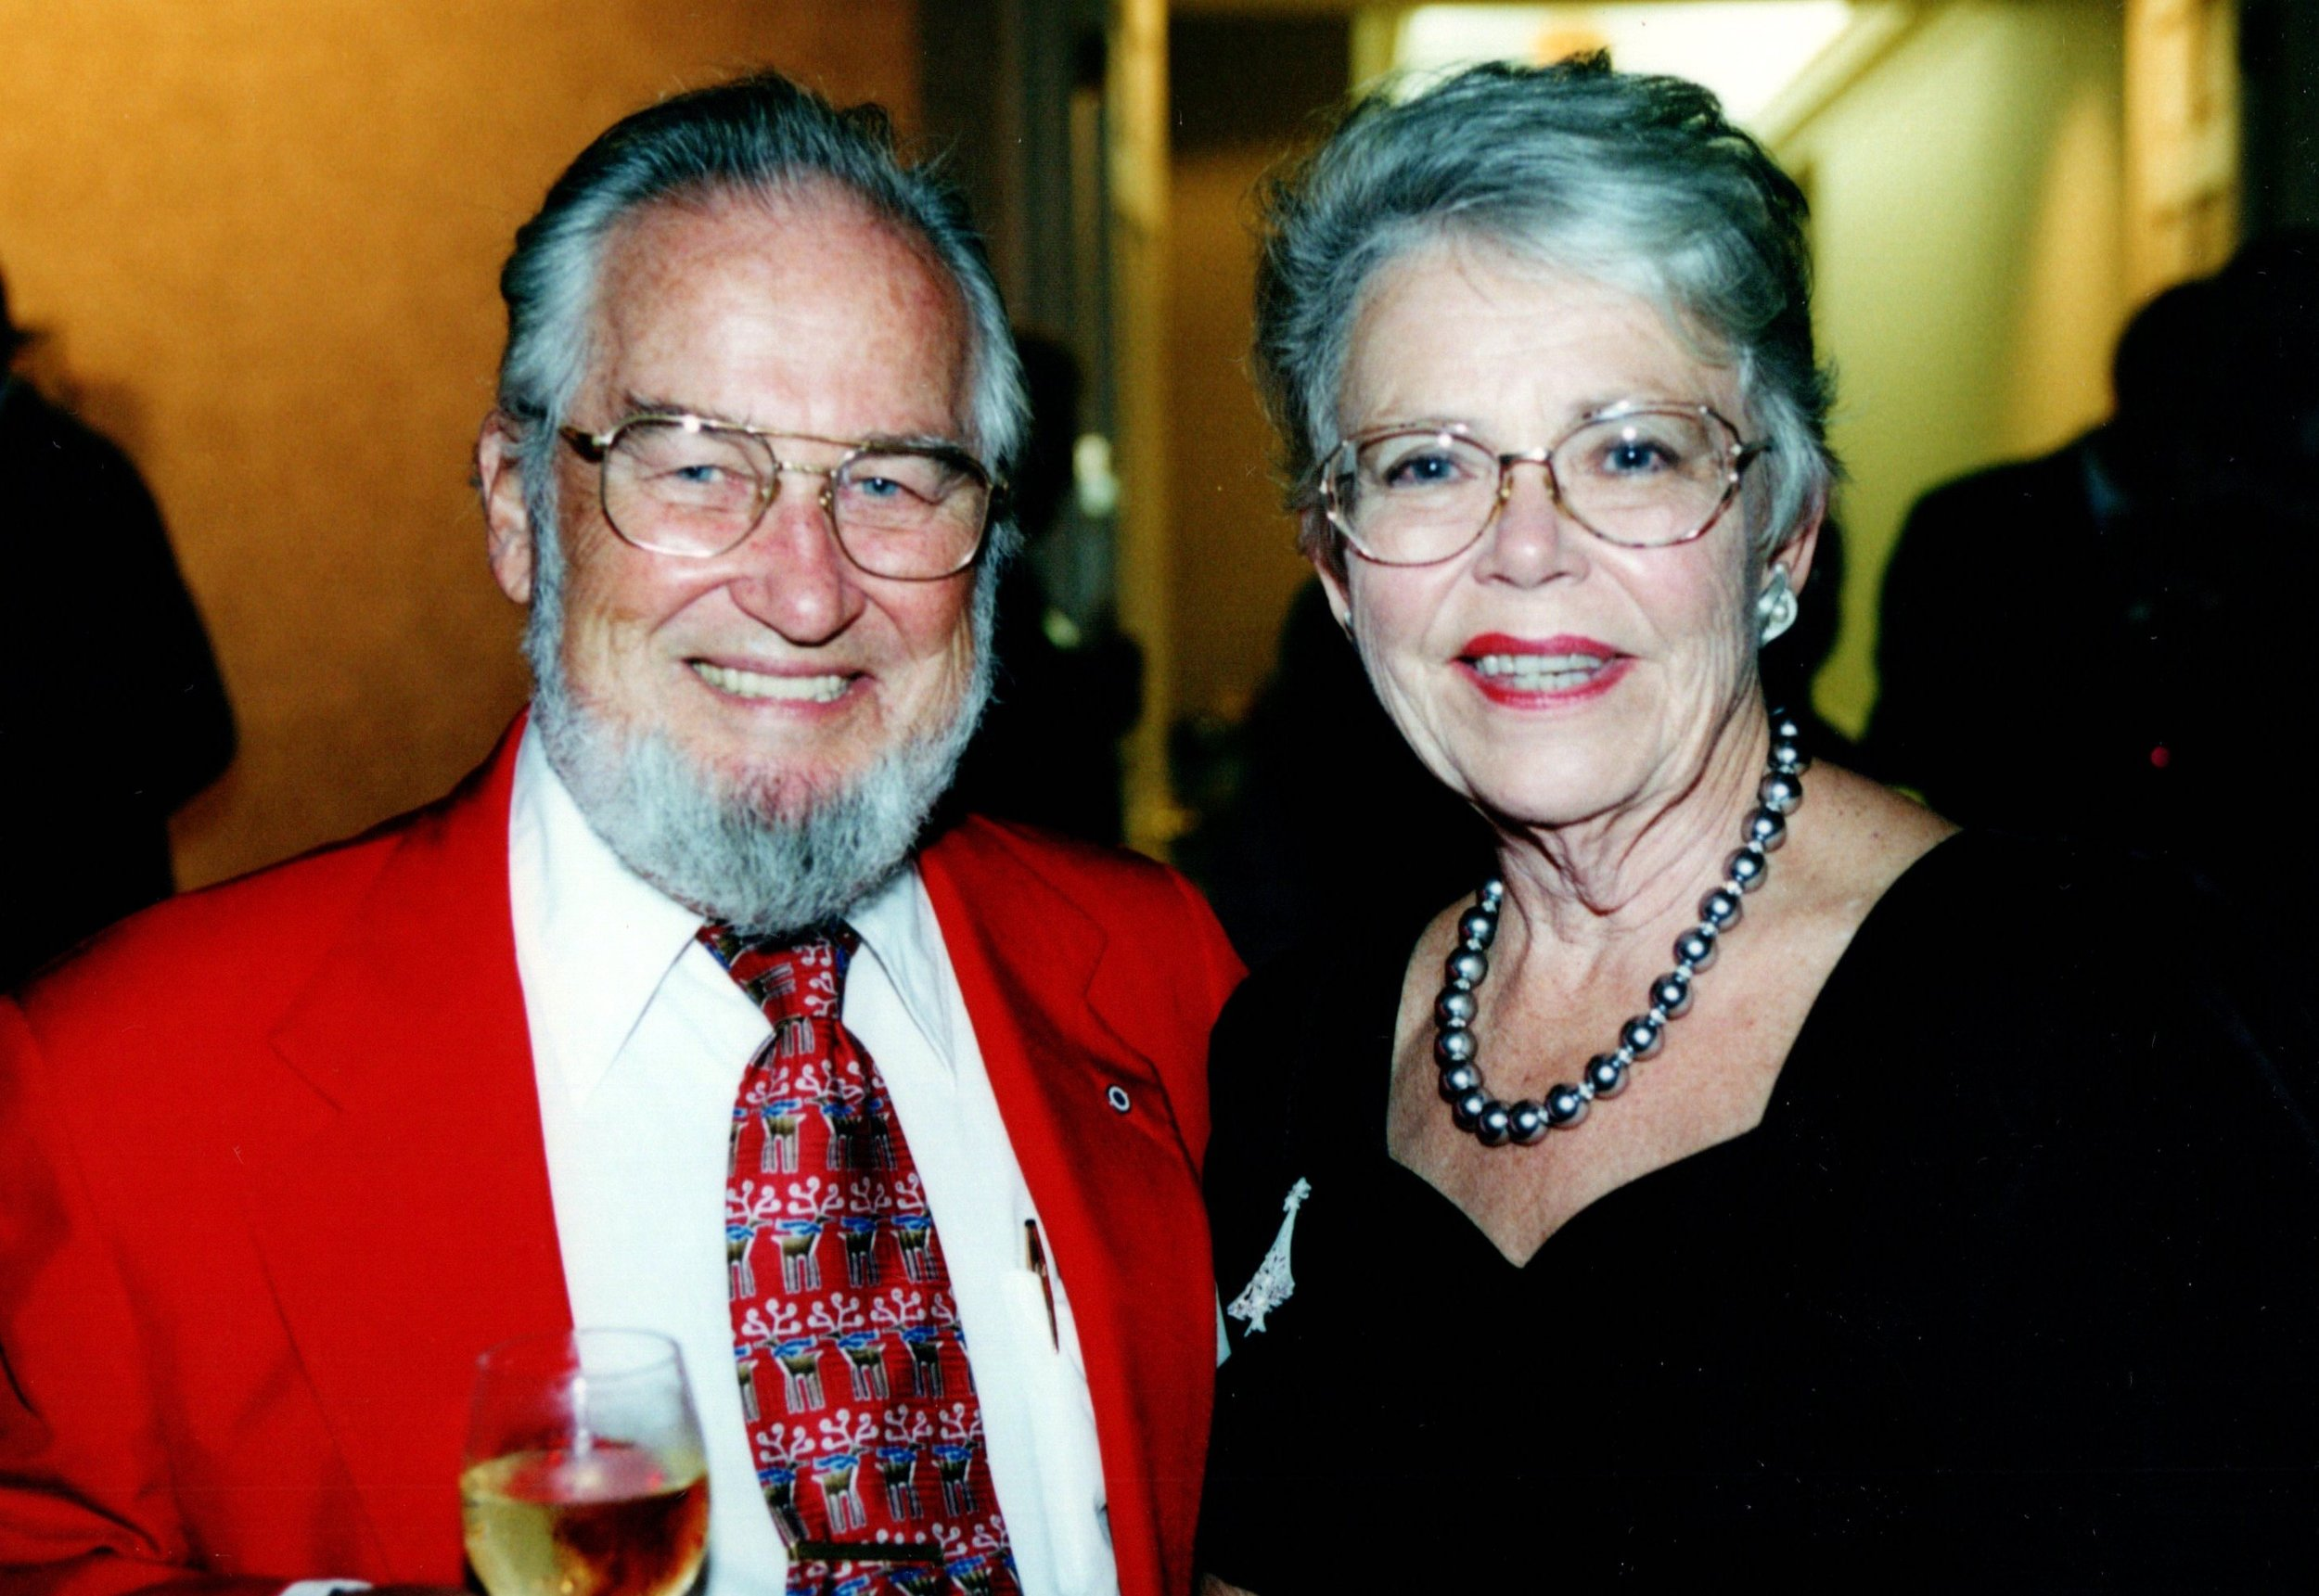 CAROL AND TED GAULT '54MDIV